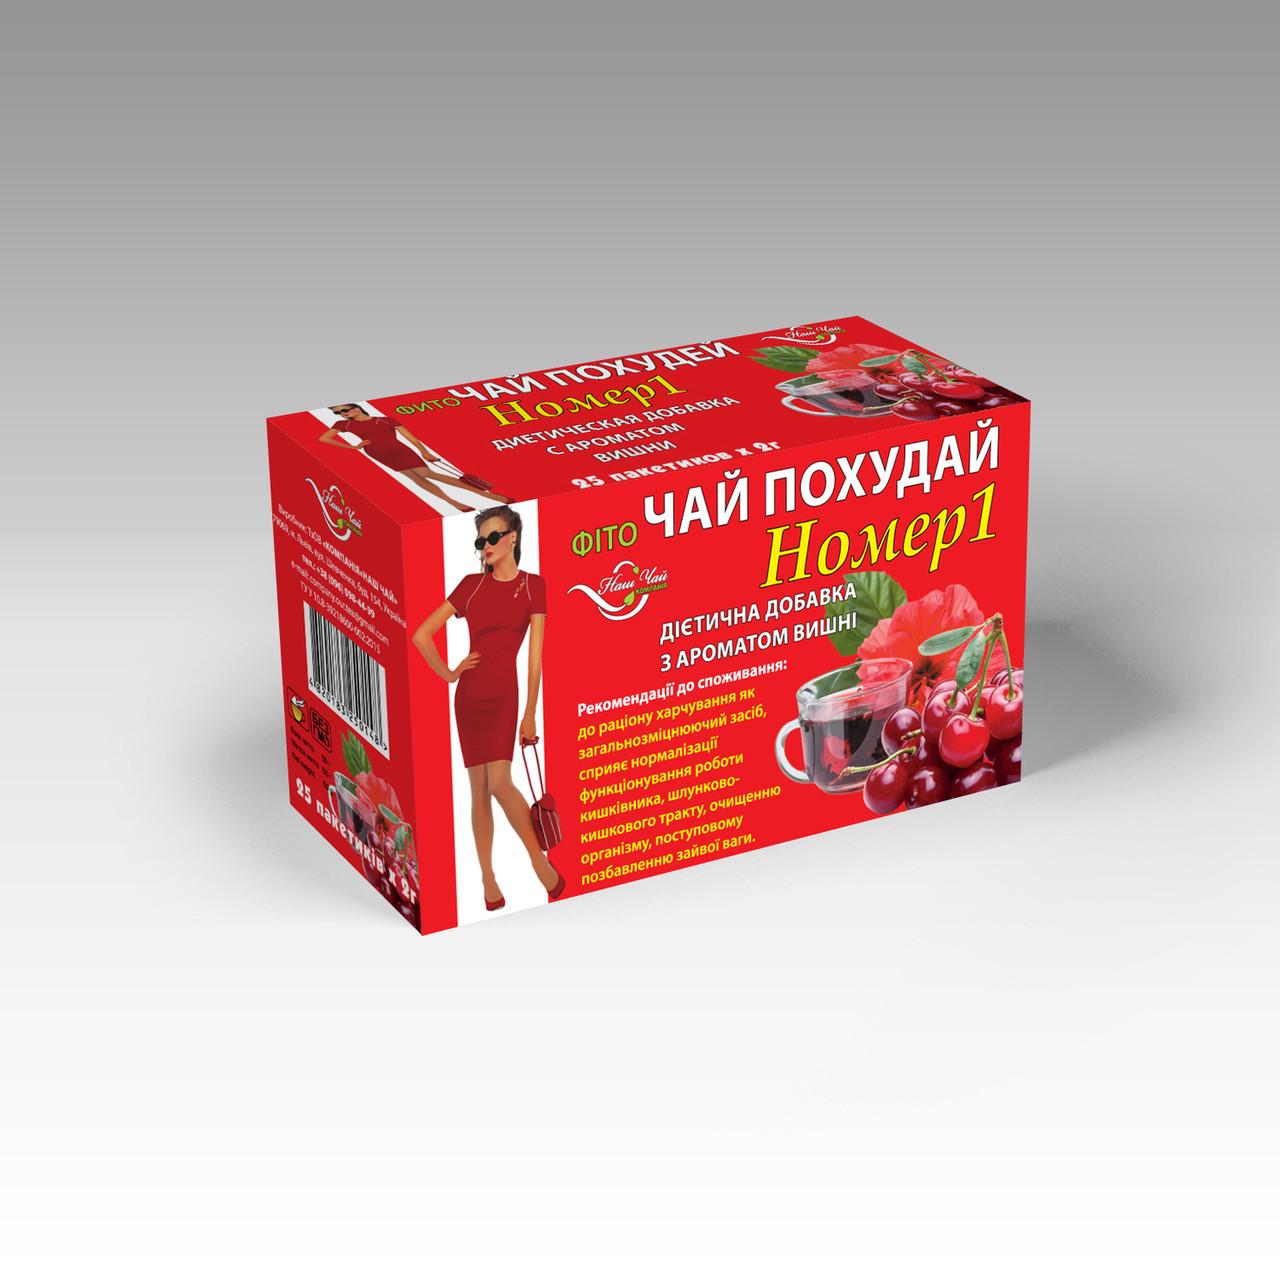 Фито чай Похудай номер 1 с ароматом Вишня